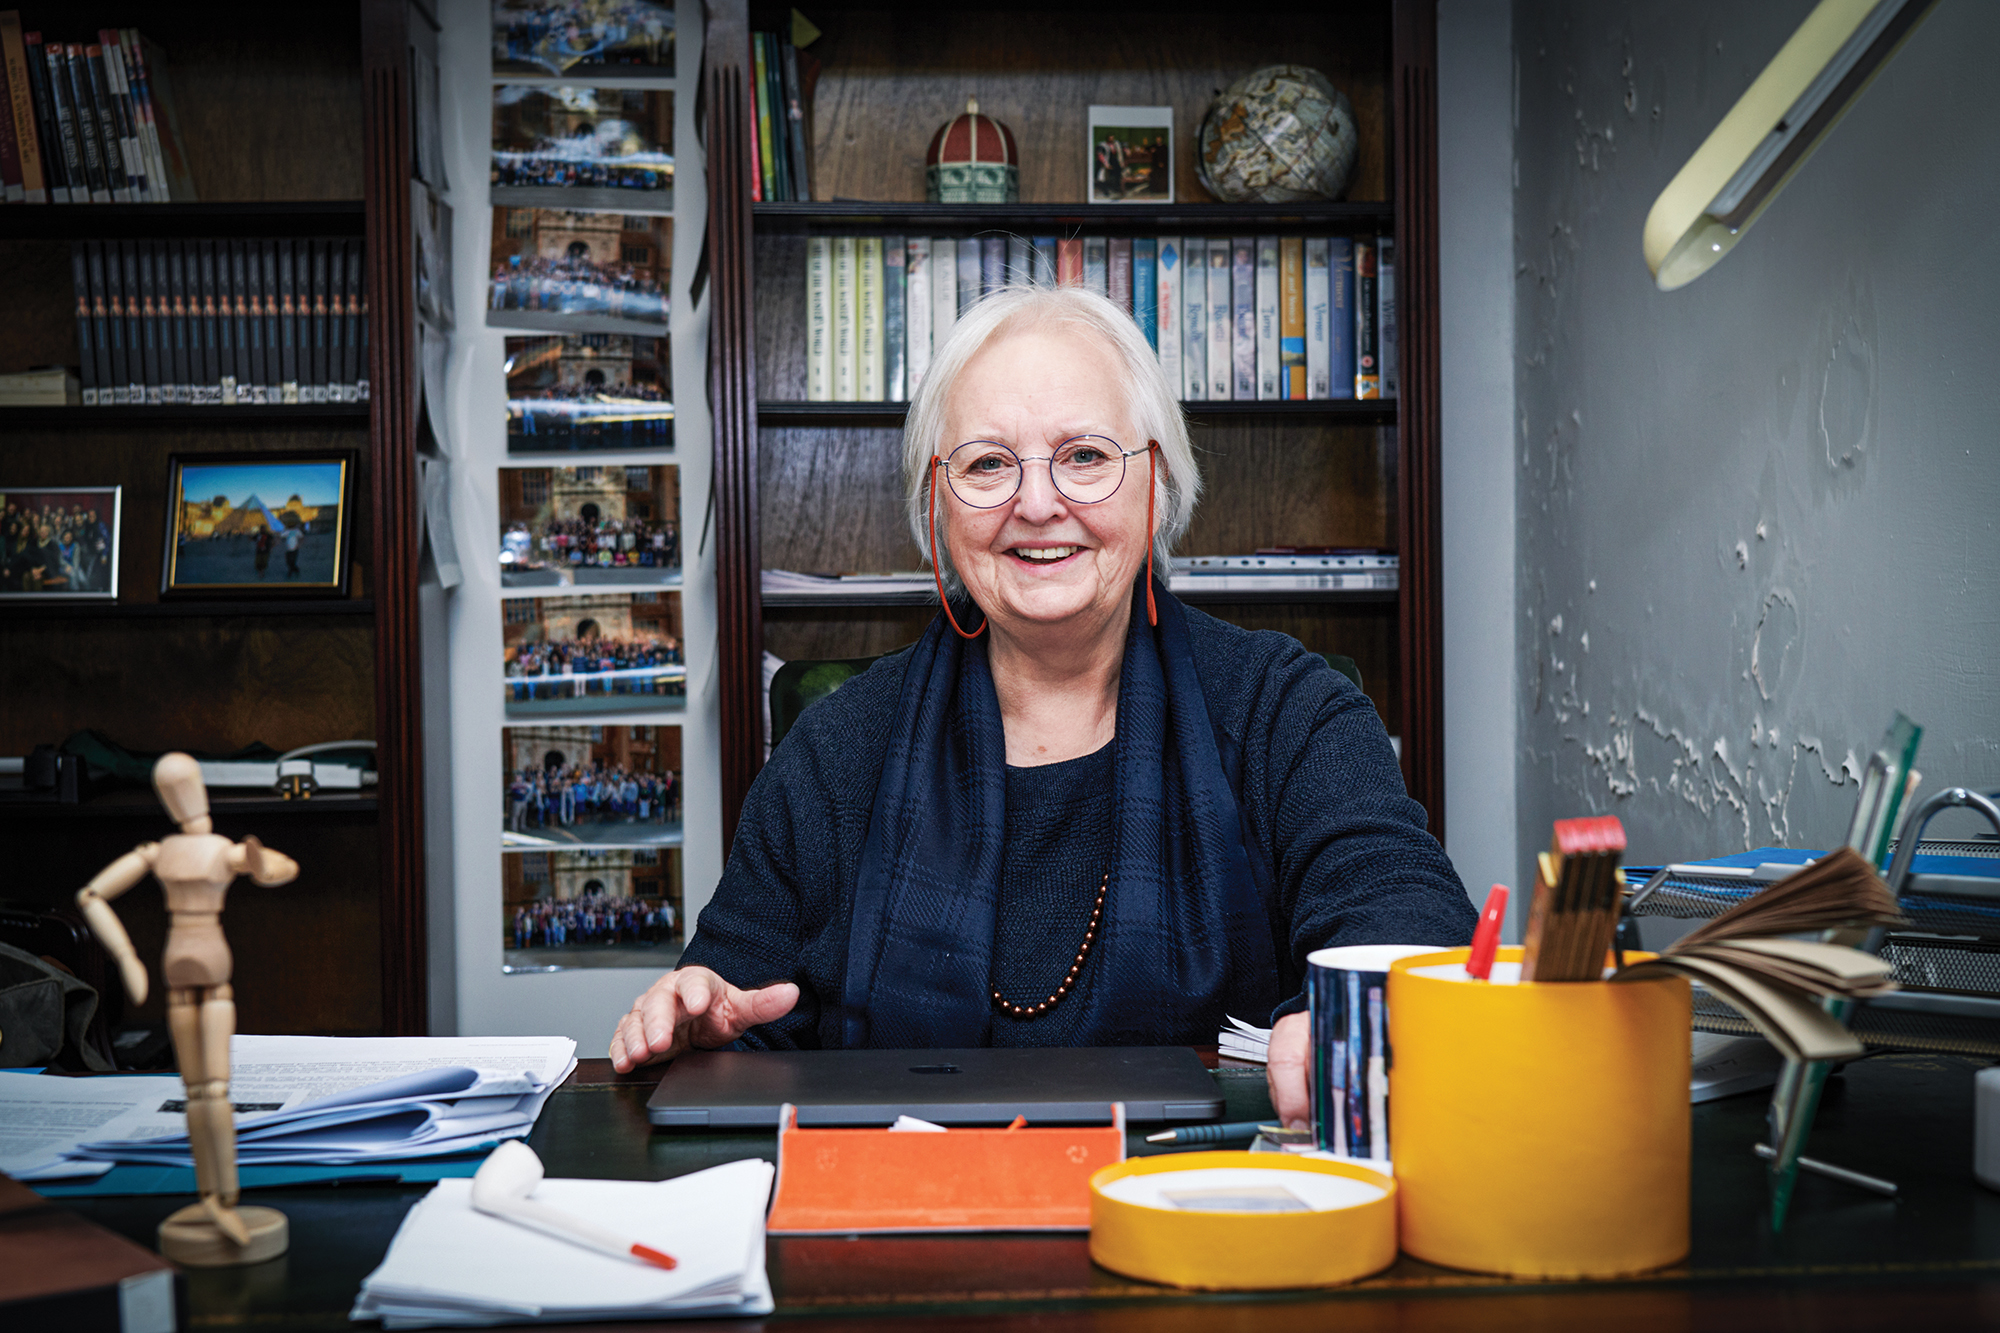 A female professor sits at her desk.